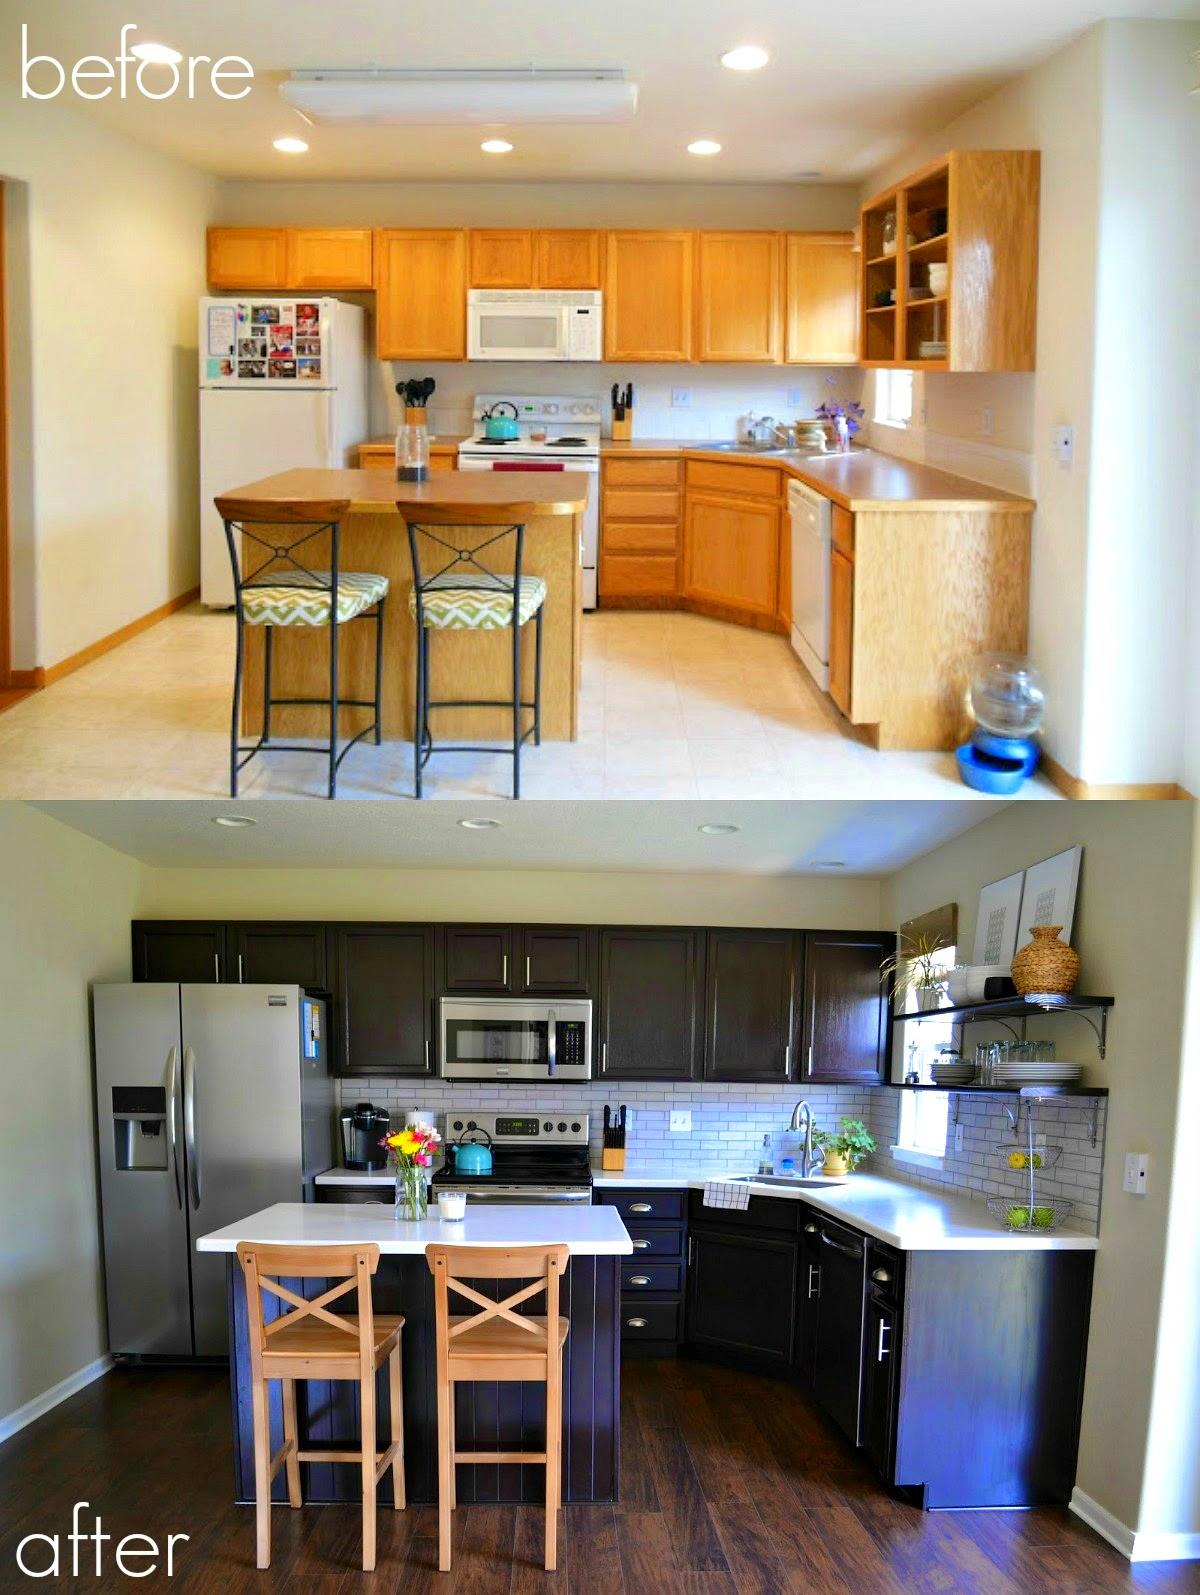 cabinet refinishing paint vs stain vs staining kitchen cabinets How to Stain Kitchen Cabinets Darker